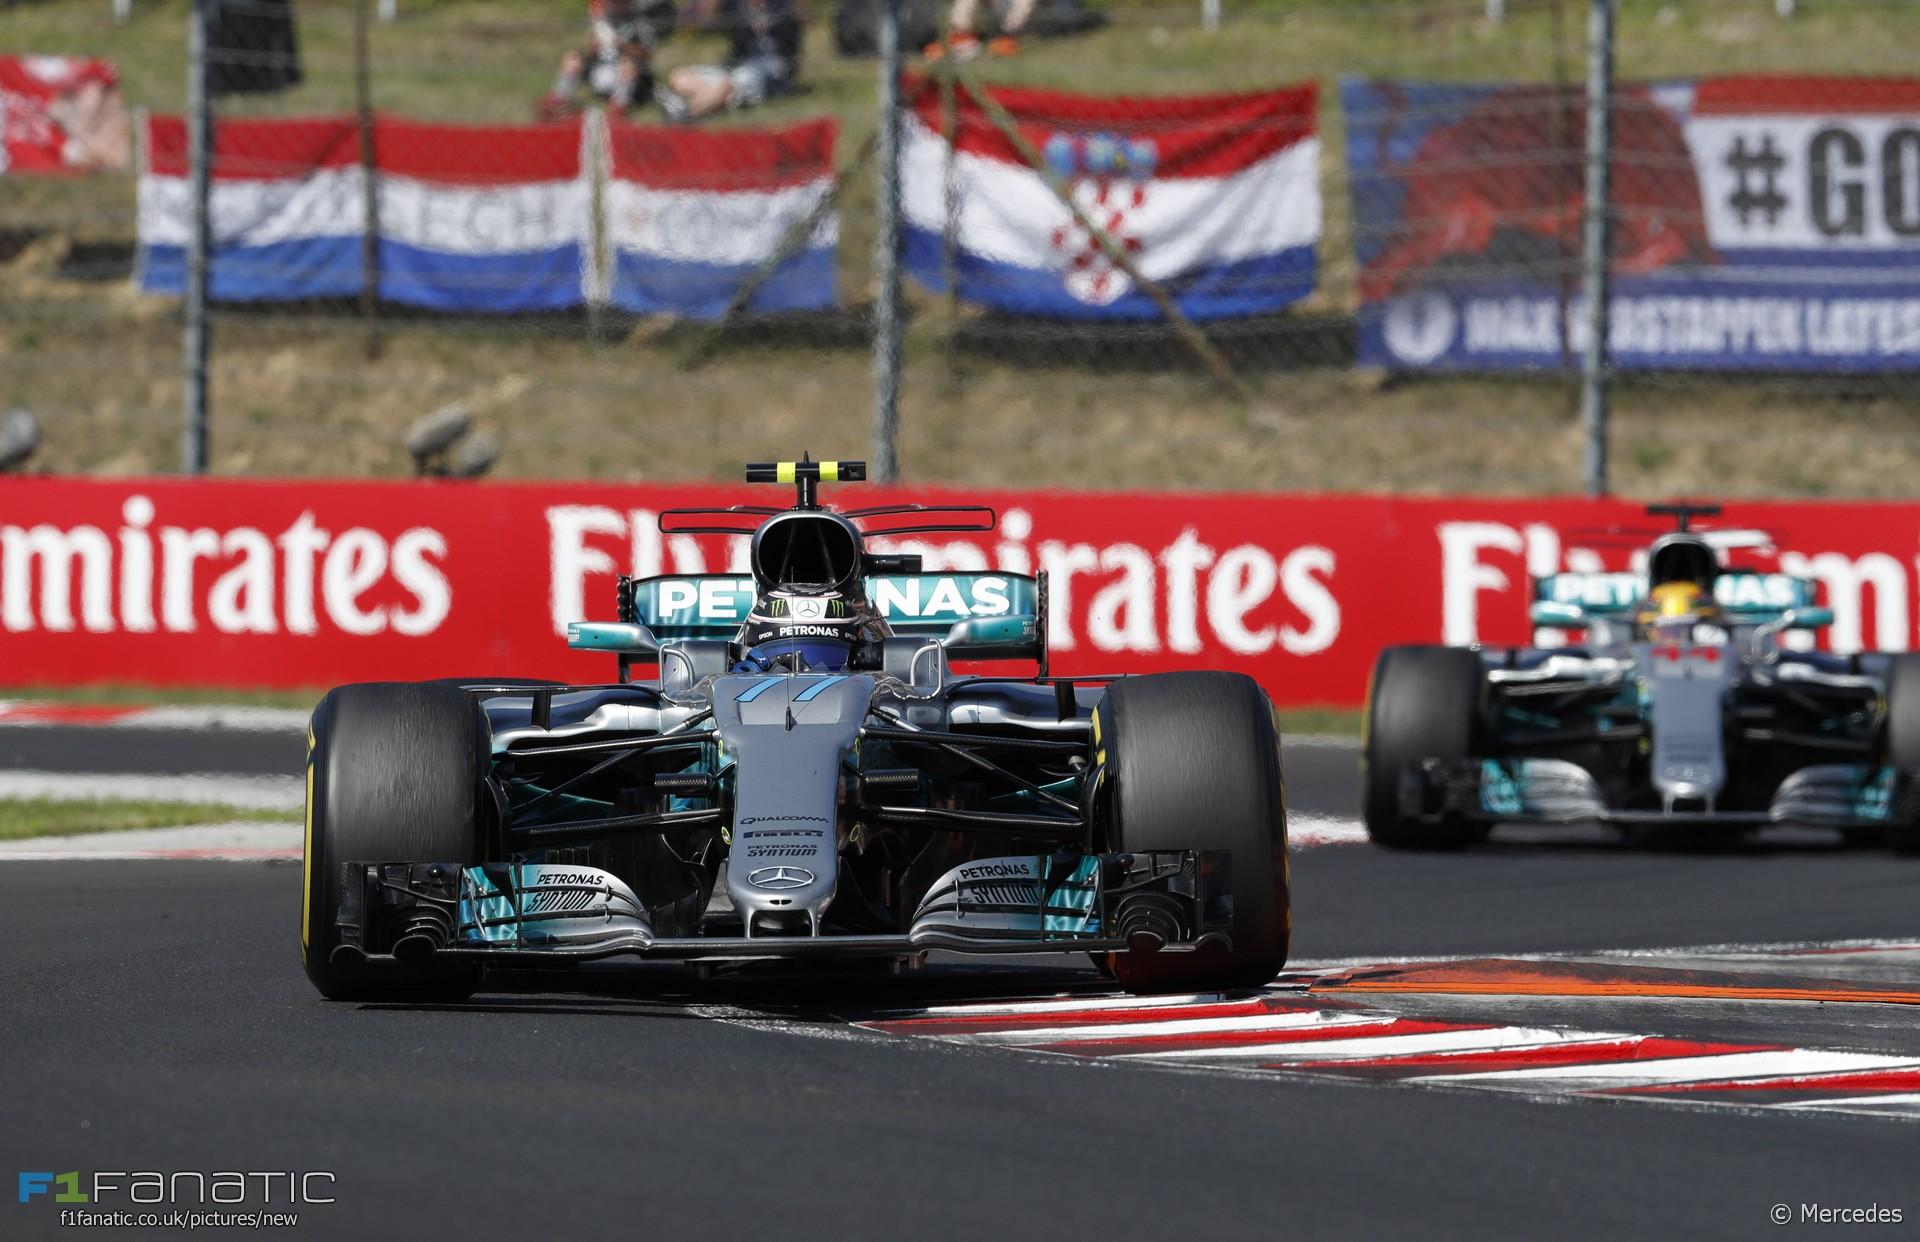 Valtteri Bottas, Mercedes, Hungaroring, 2017